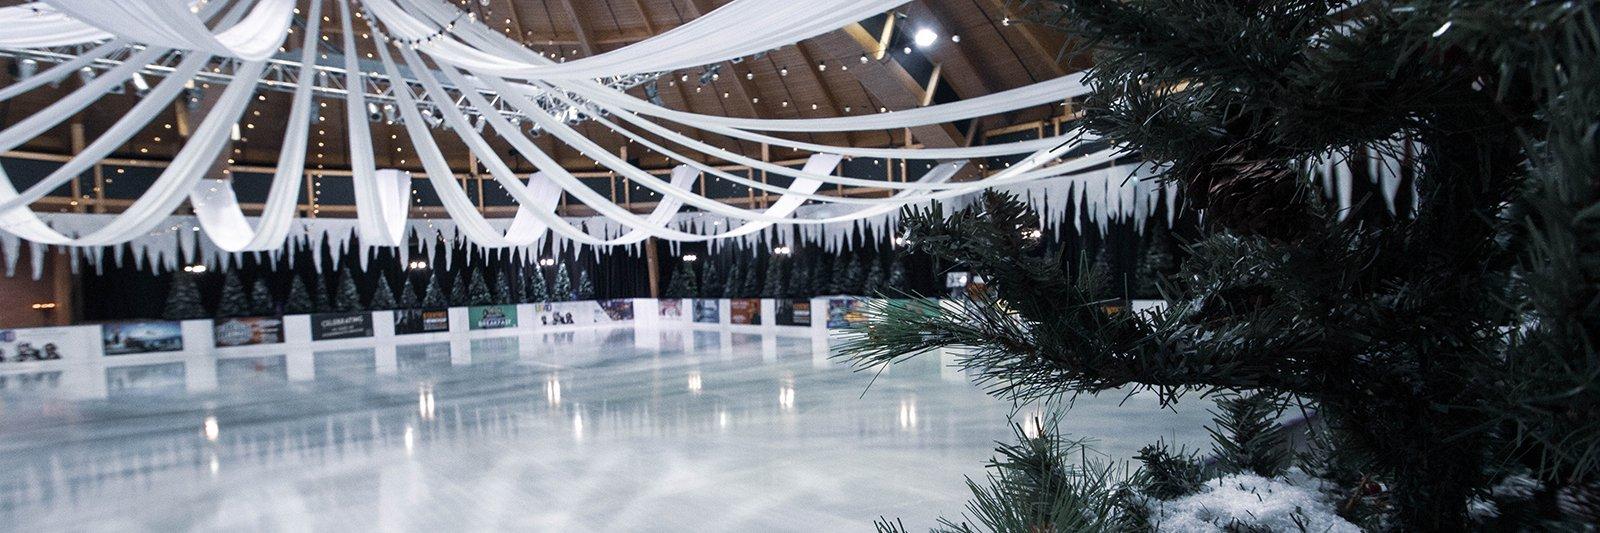 BIC Ice Rink